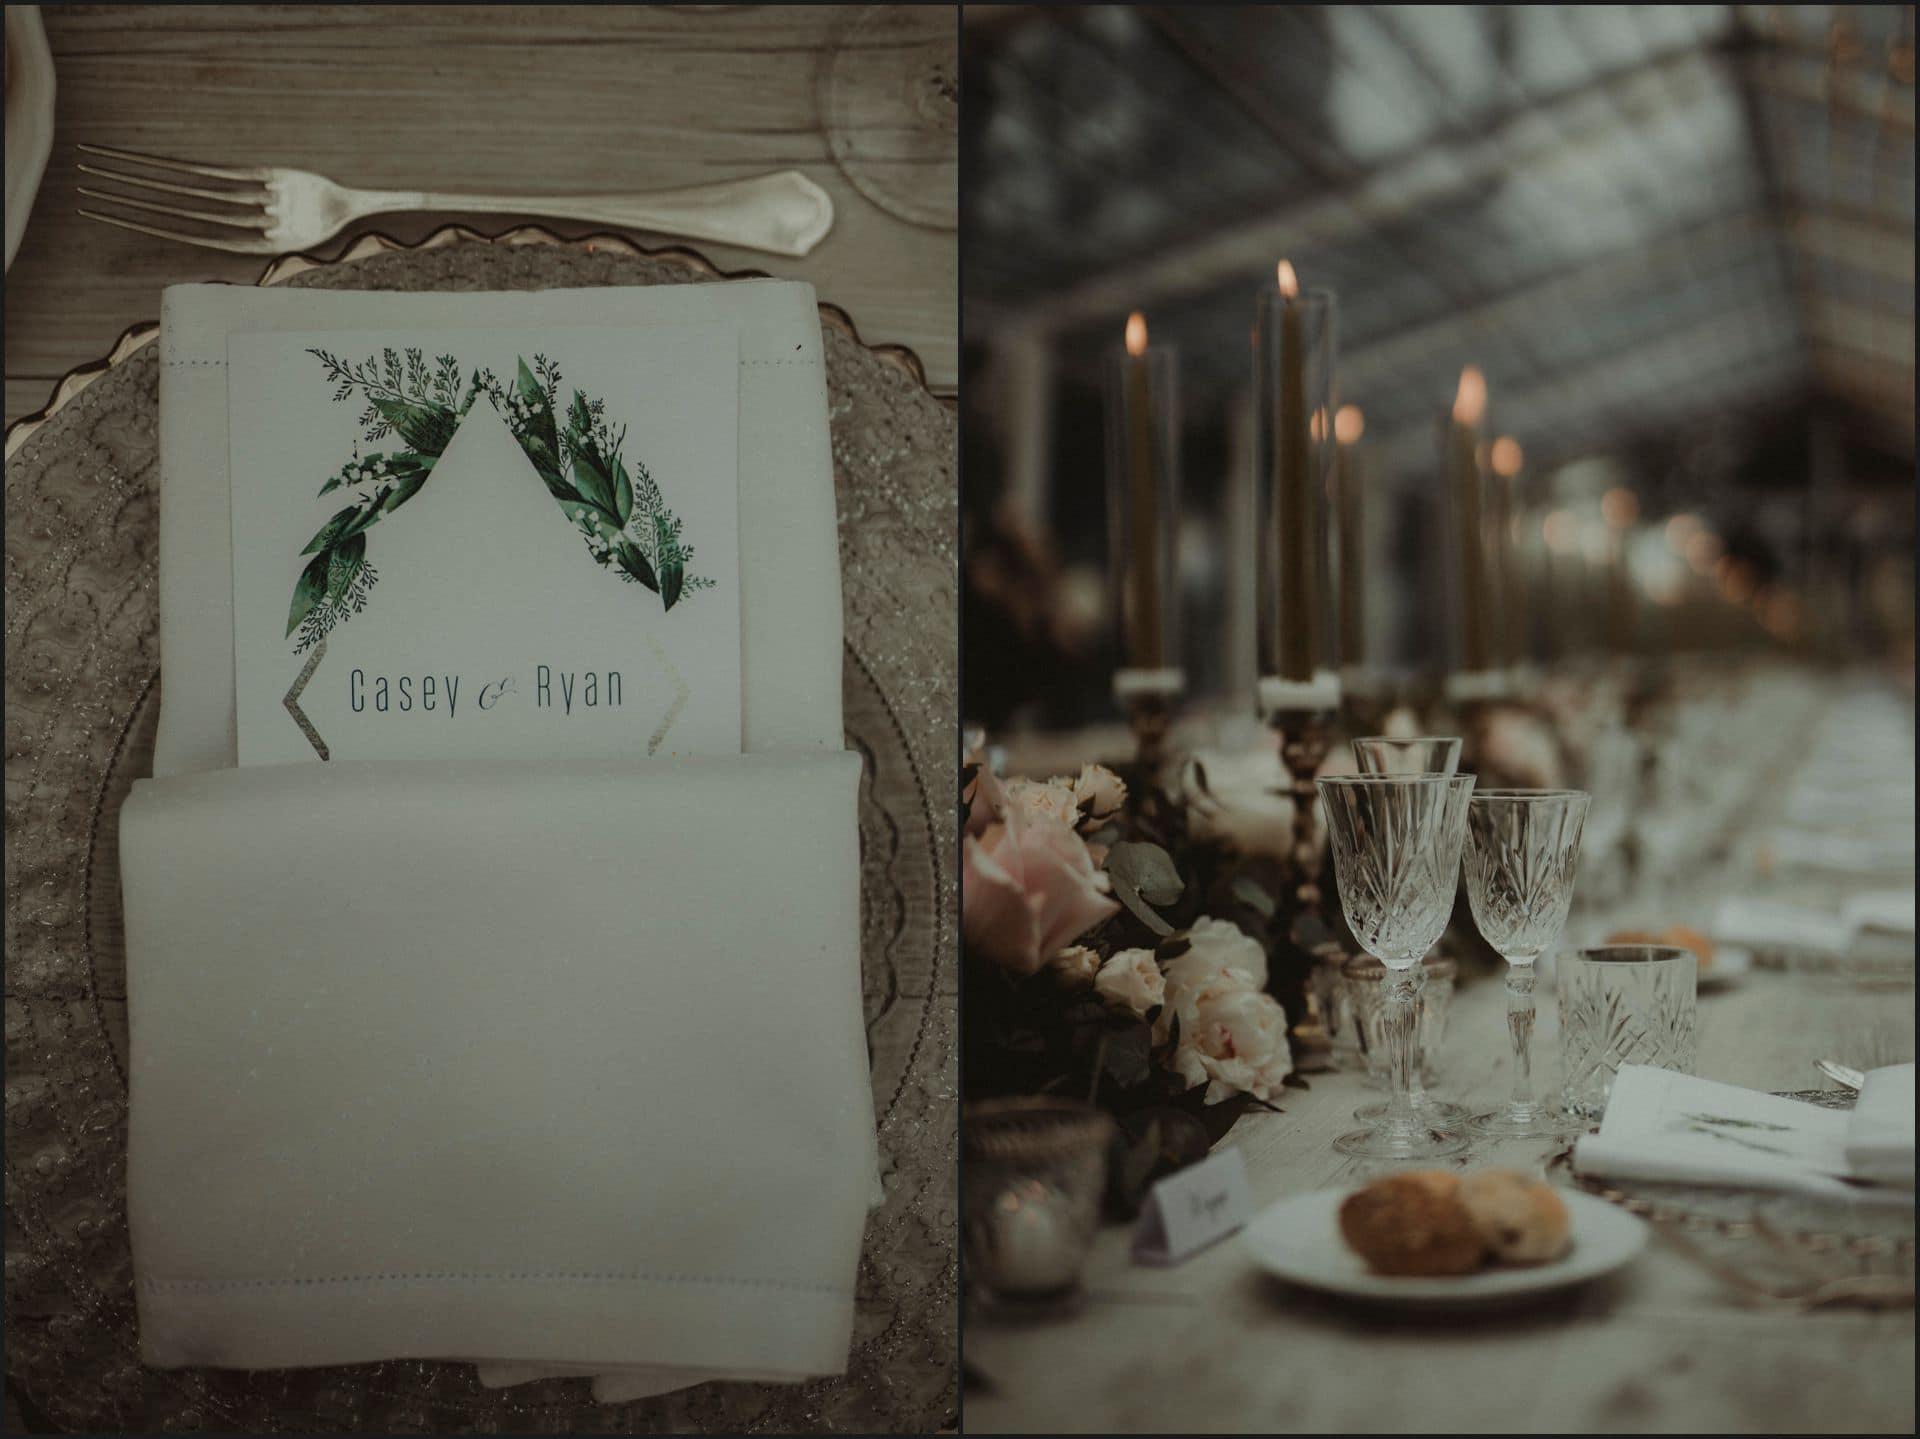 tuscany, destination wedding, chianti, table setting, menu, details